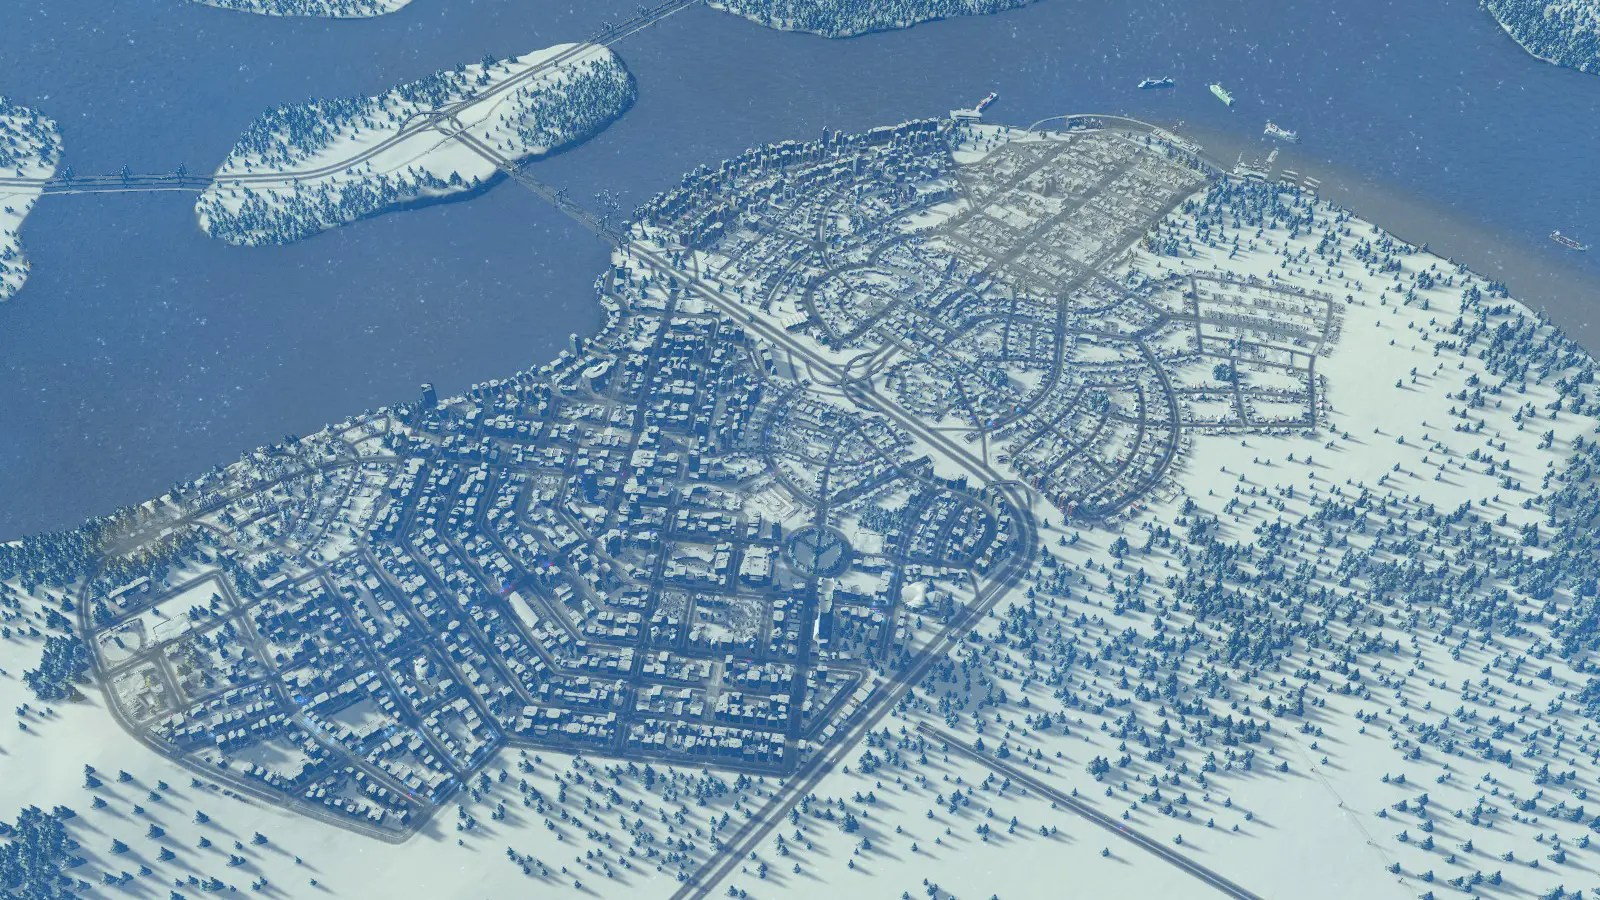 CitiesSkylinesSnowfall-review1